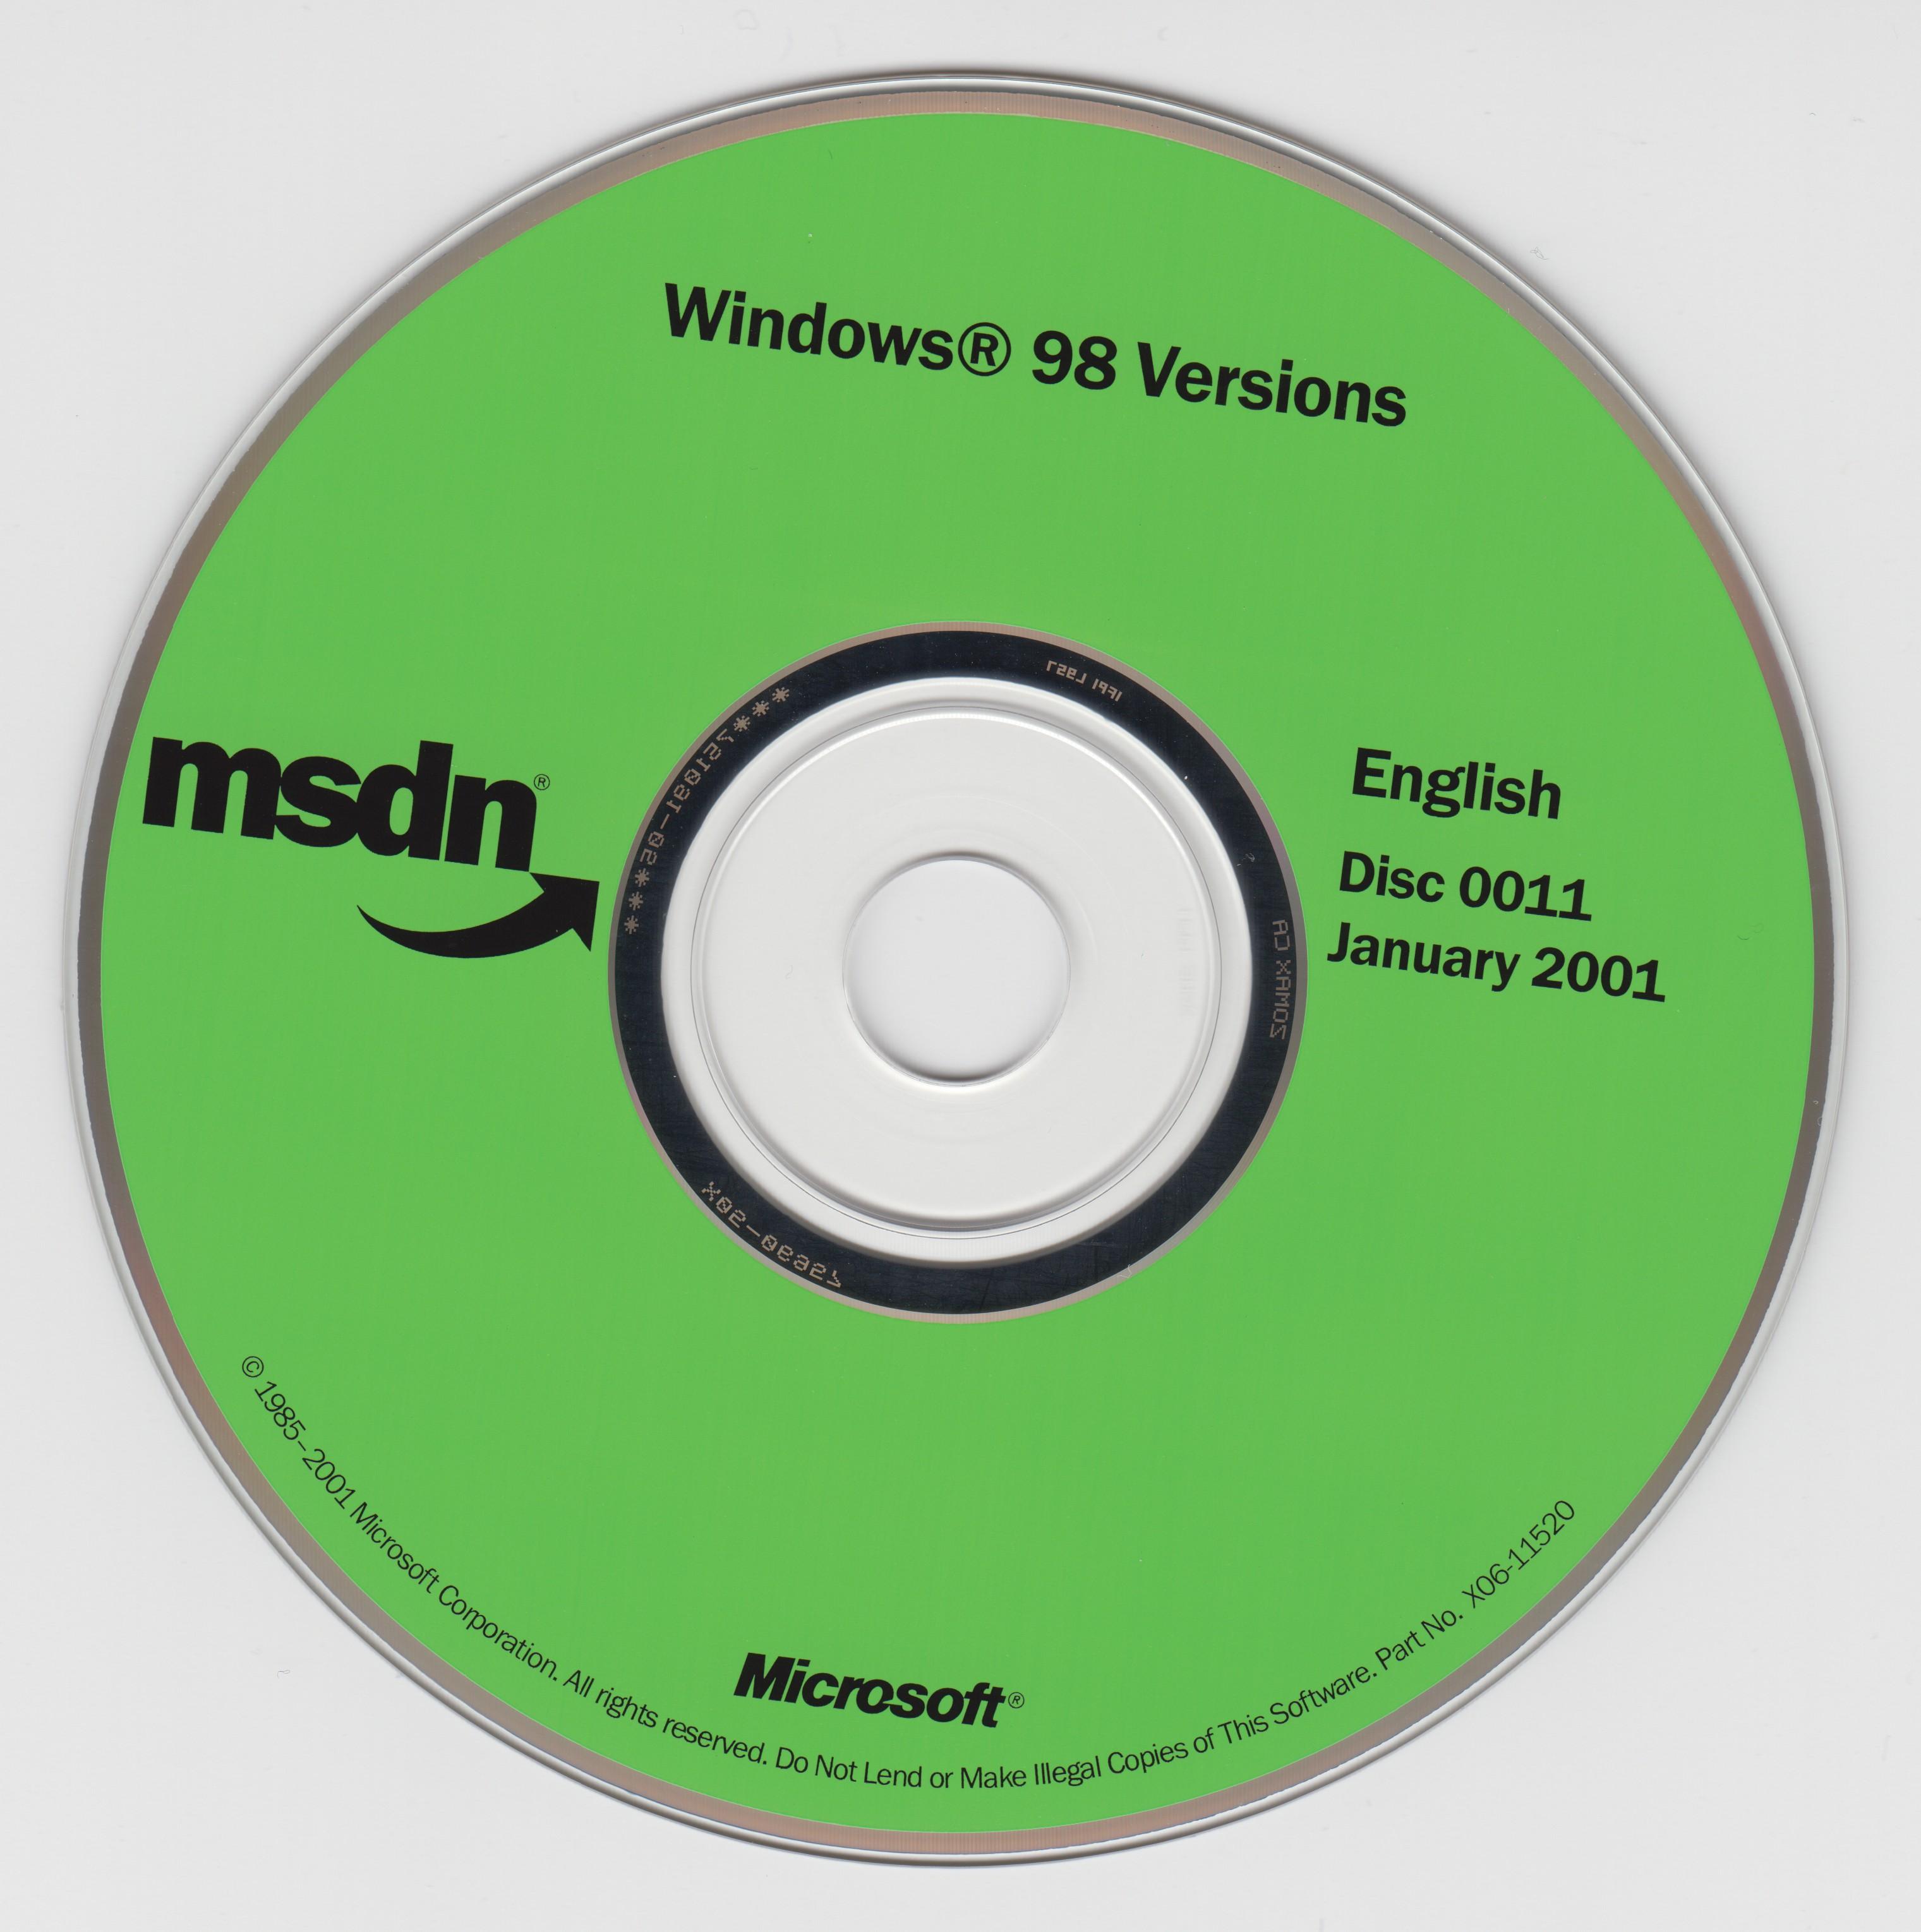 MSDN Windows 98 Disc 0011 January 2001 : Free Download, Borrow, and